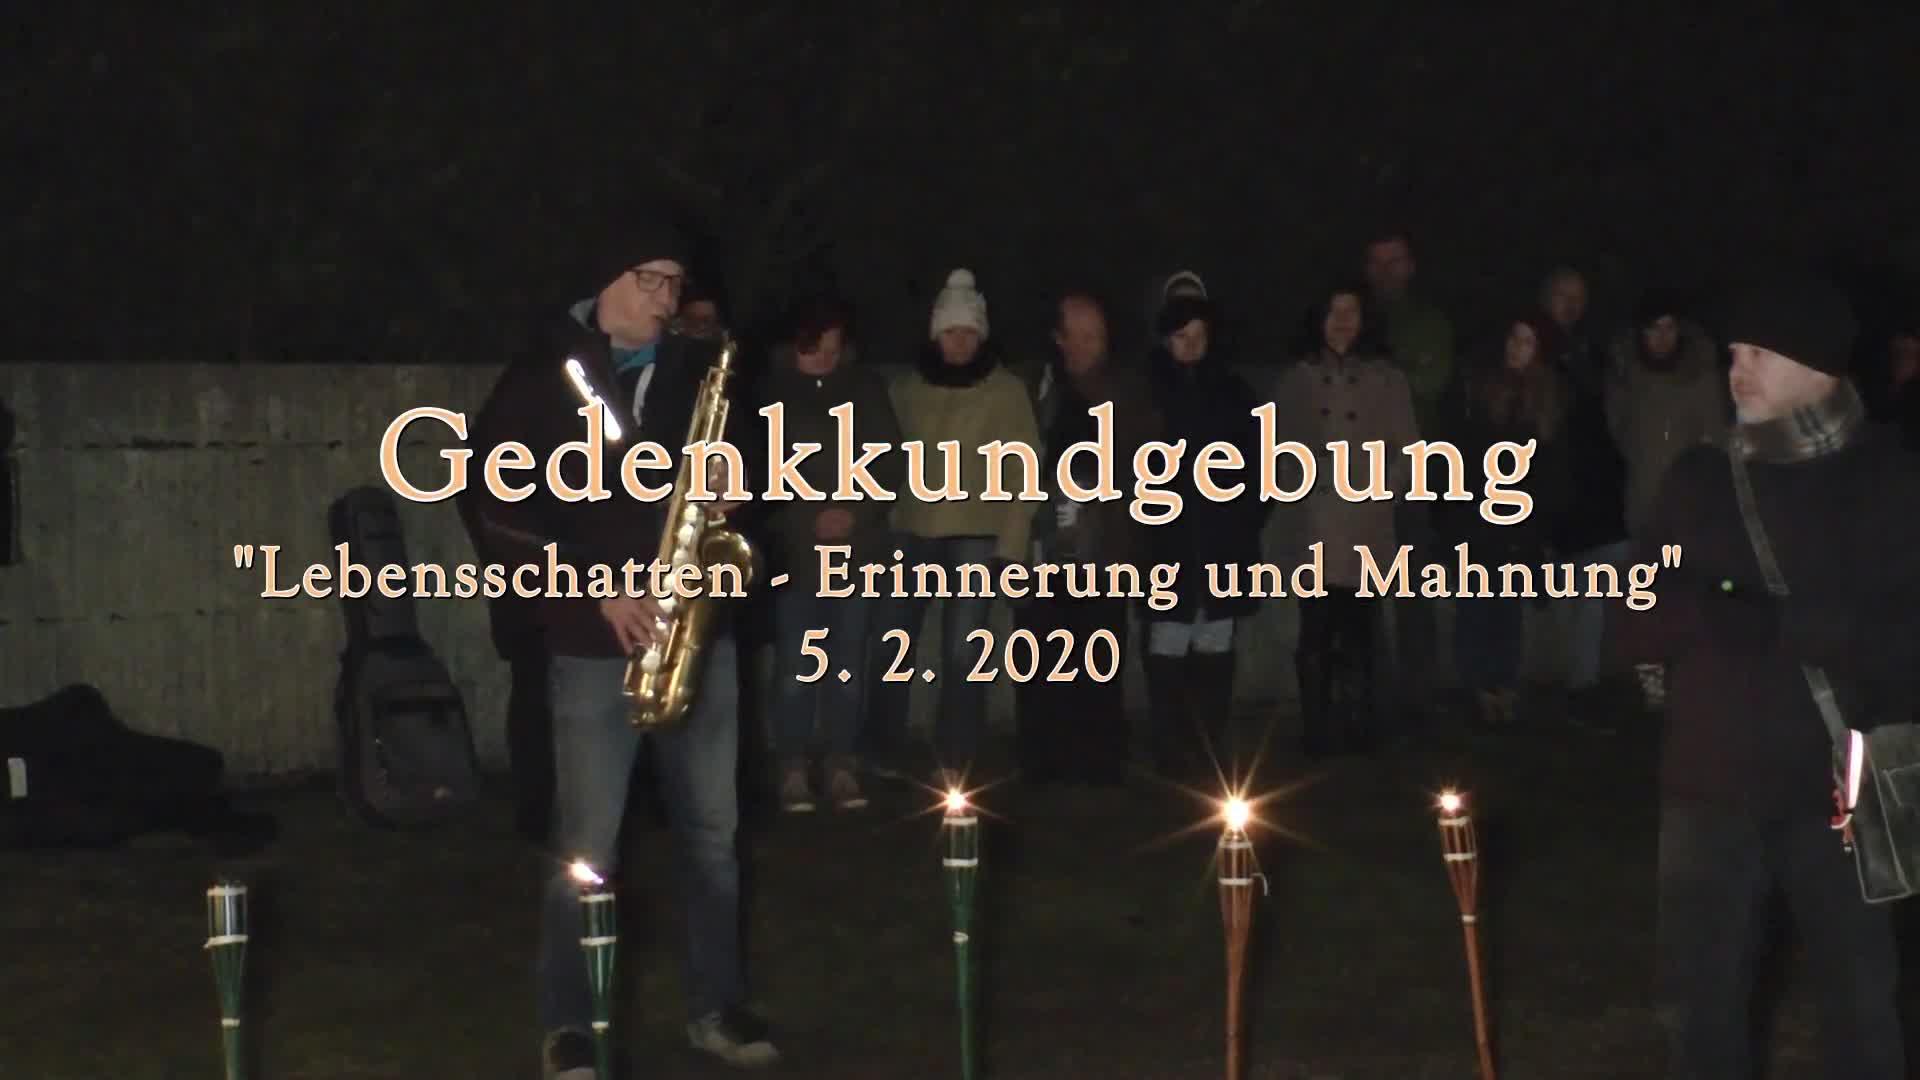 Gedenkkundgebung 2020